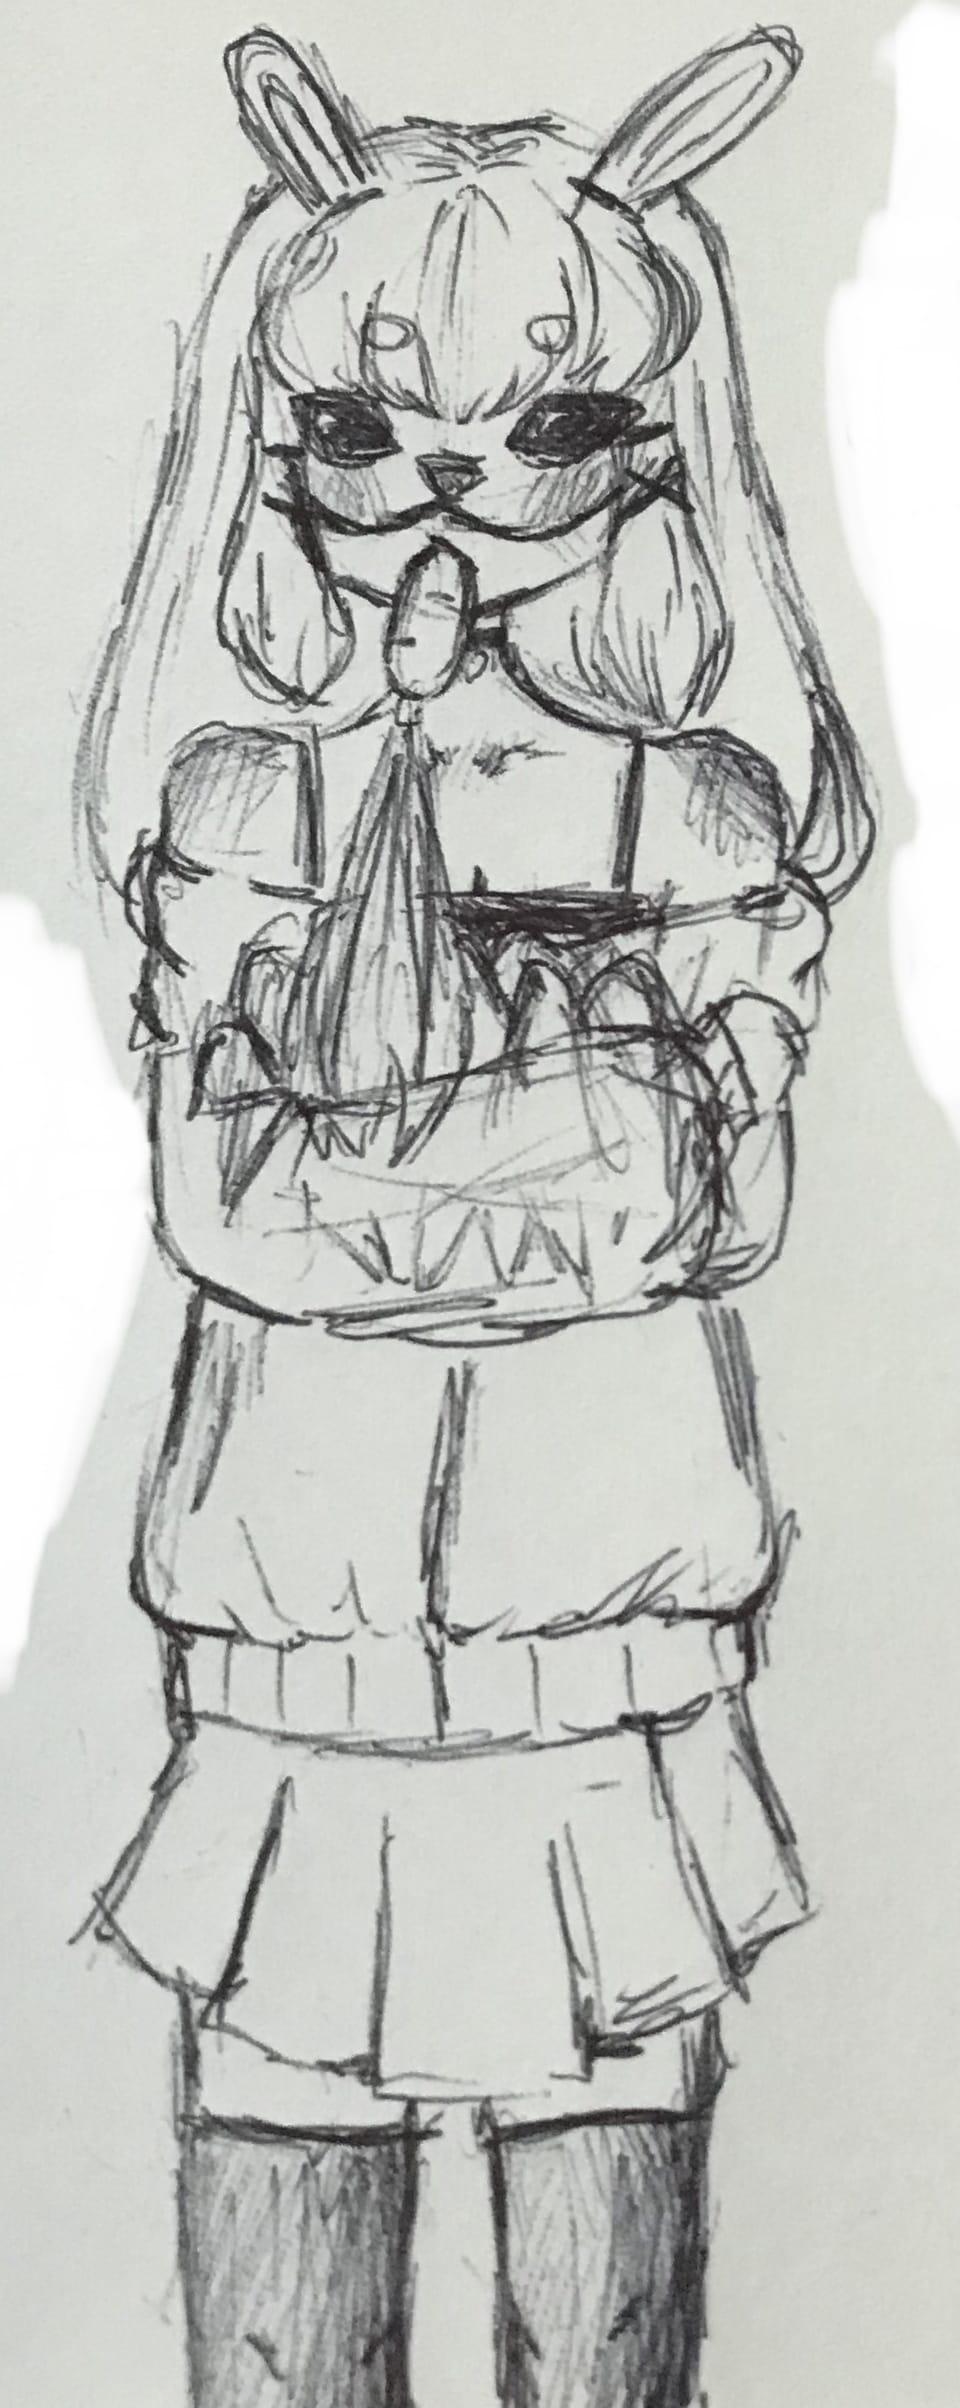 nom nom Illust of AnonymouseSaysHoooi pen sketch daily_doodlez traditional_art bunny gorl